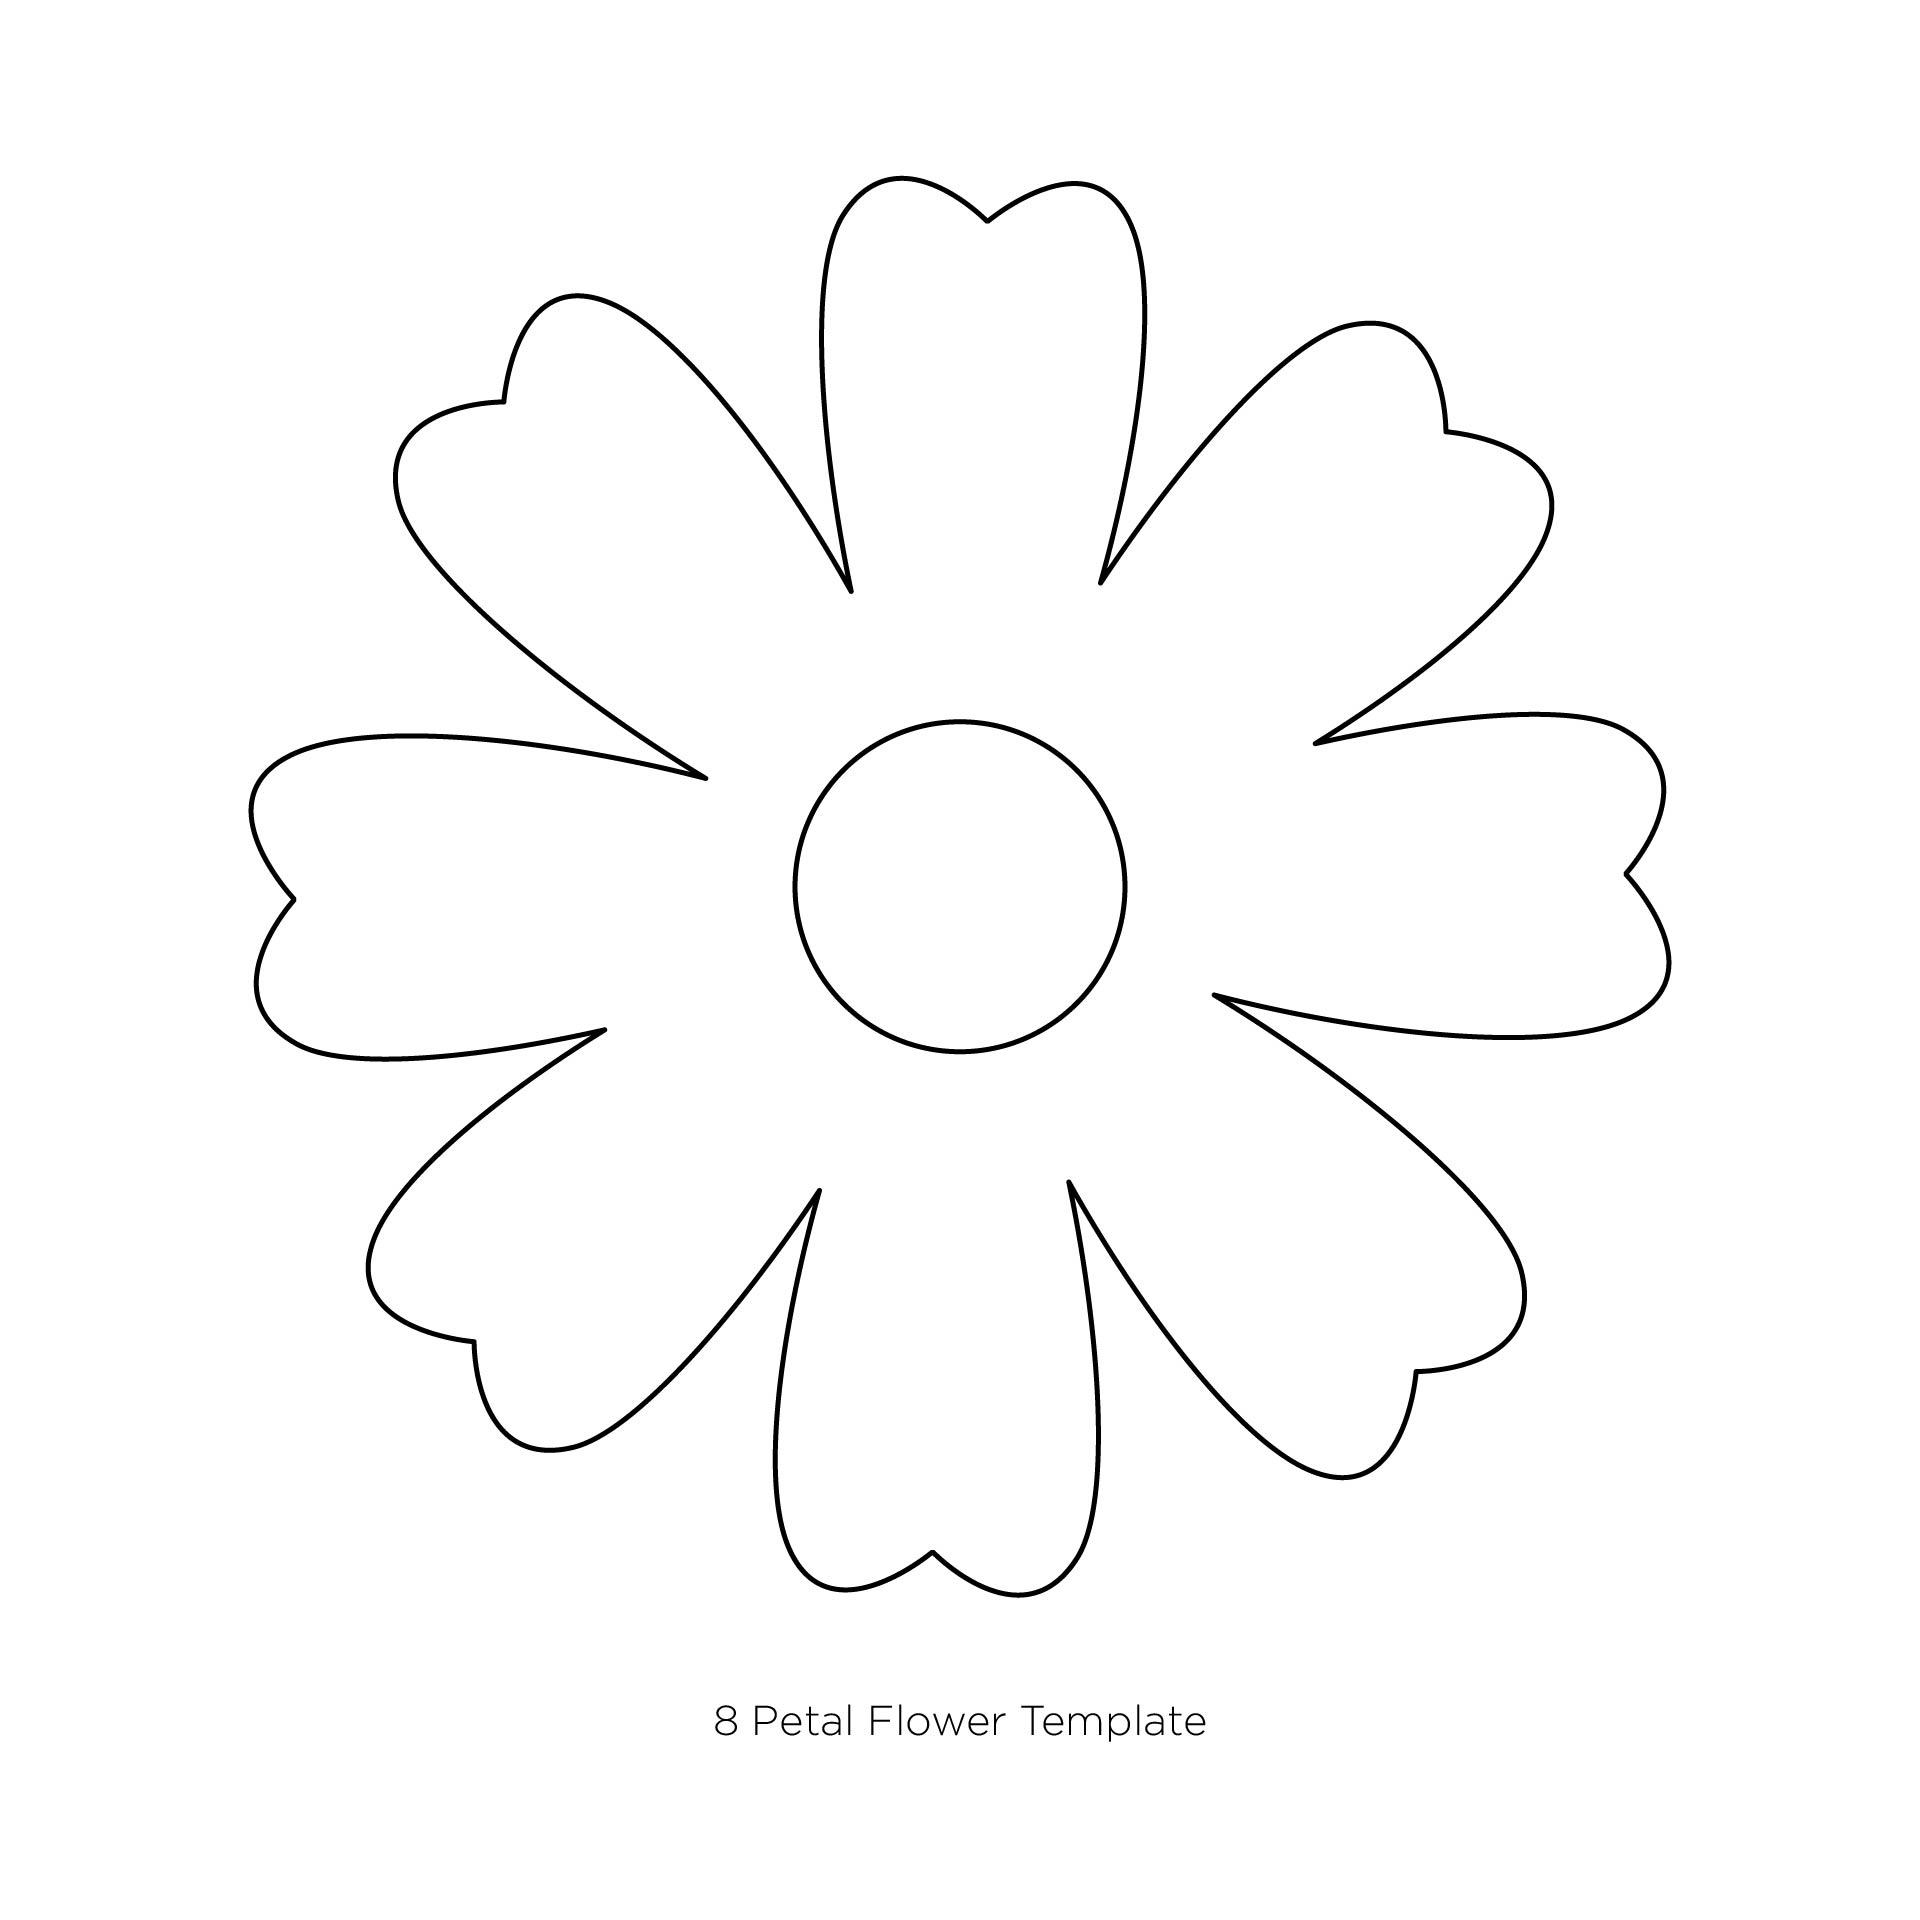 7 Best Images of Paper Flower Petal Template Printable